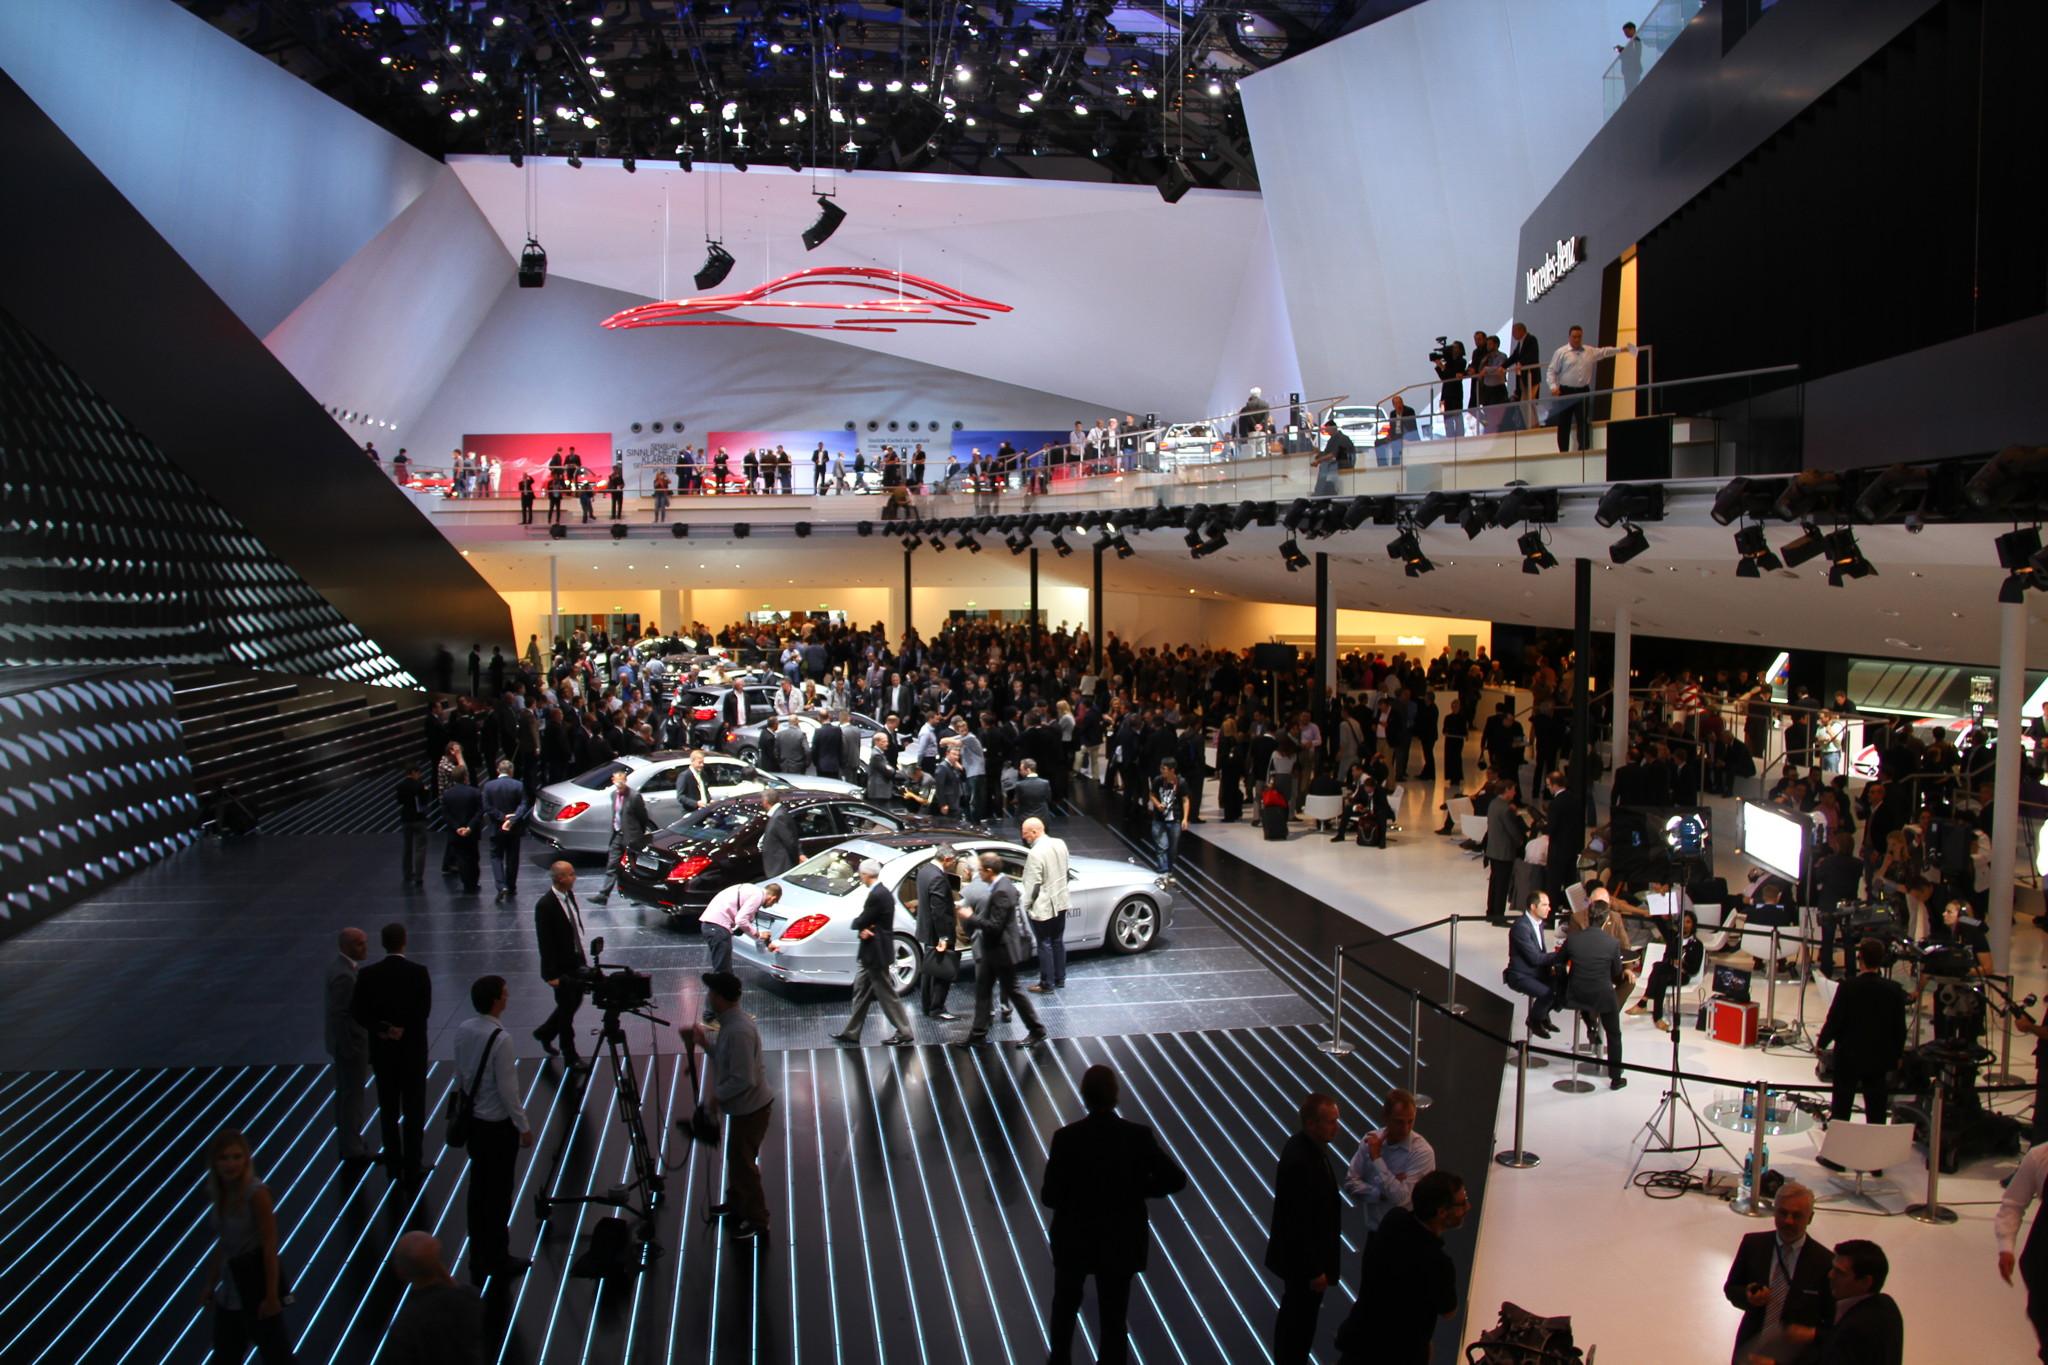 Salon de l 39 auto de francfort plus de 200 premi res mondiales - Salon de l automobile francfort ...